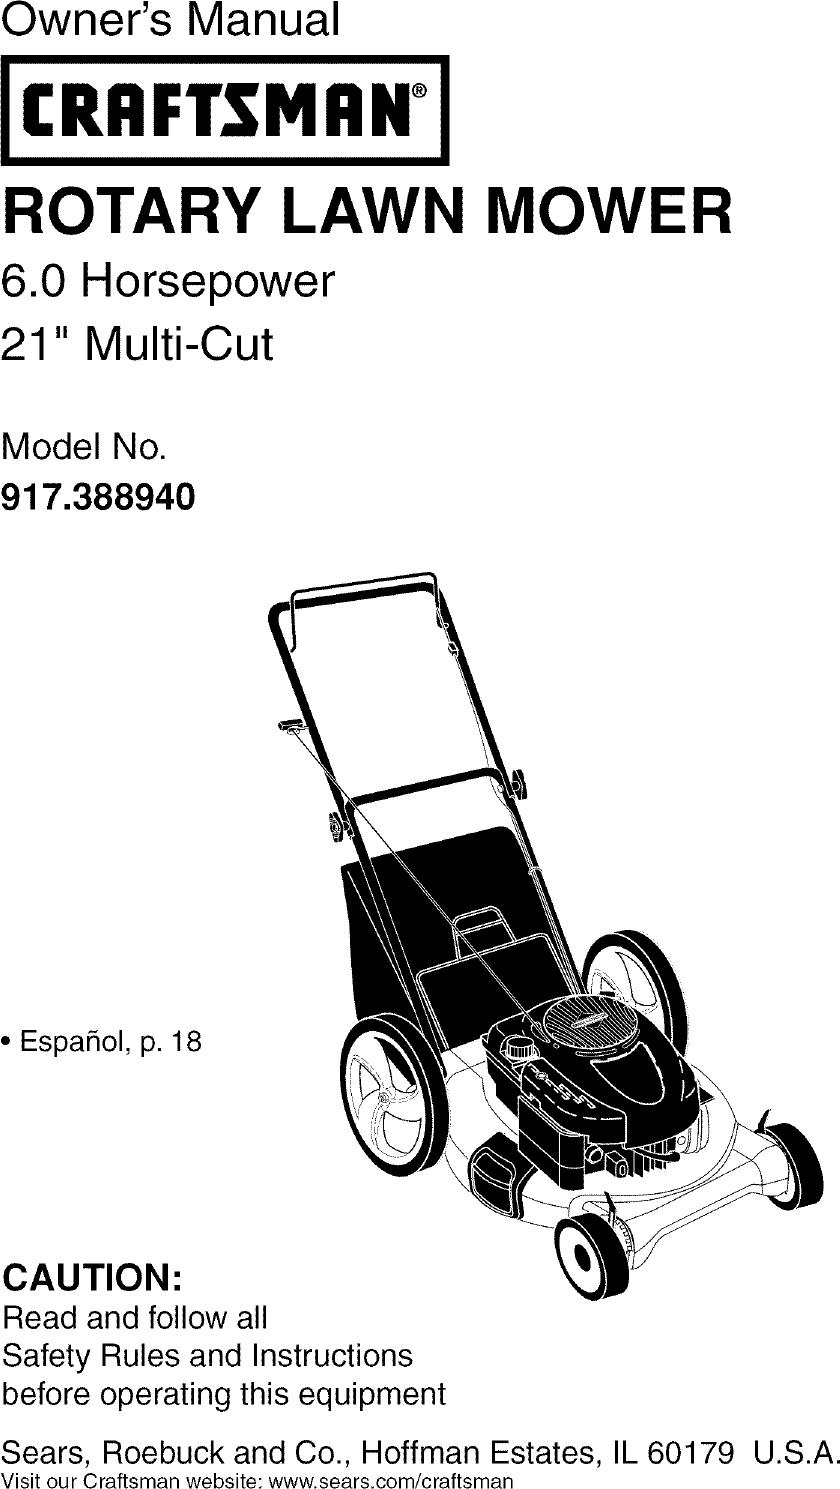 Craftsman 917388940 User Manual LAWN MOWER Manuals And